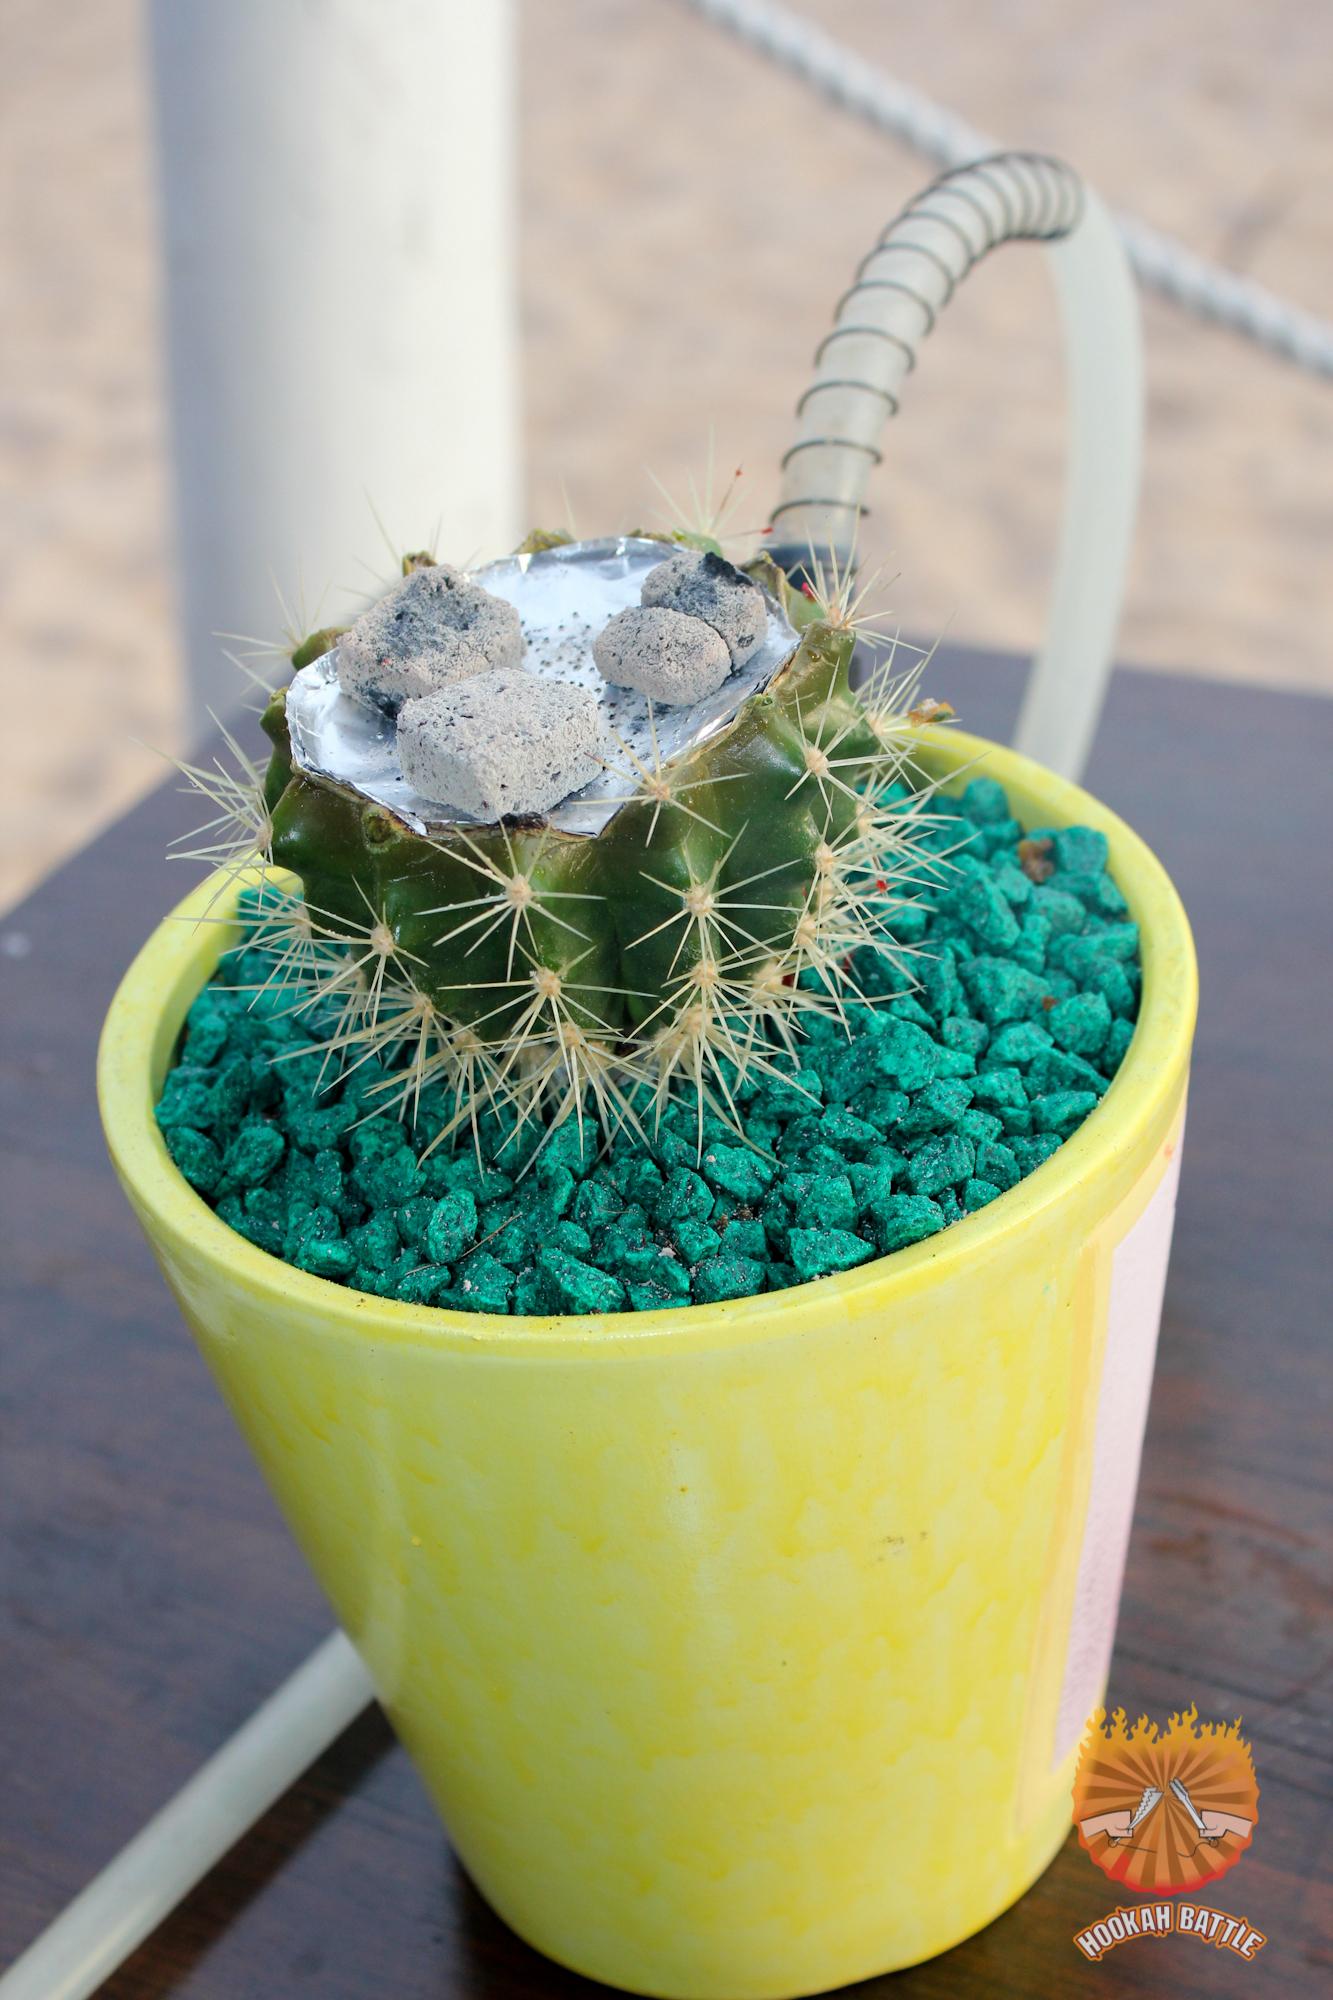 Hookah Cactus par Alexander Trofimo